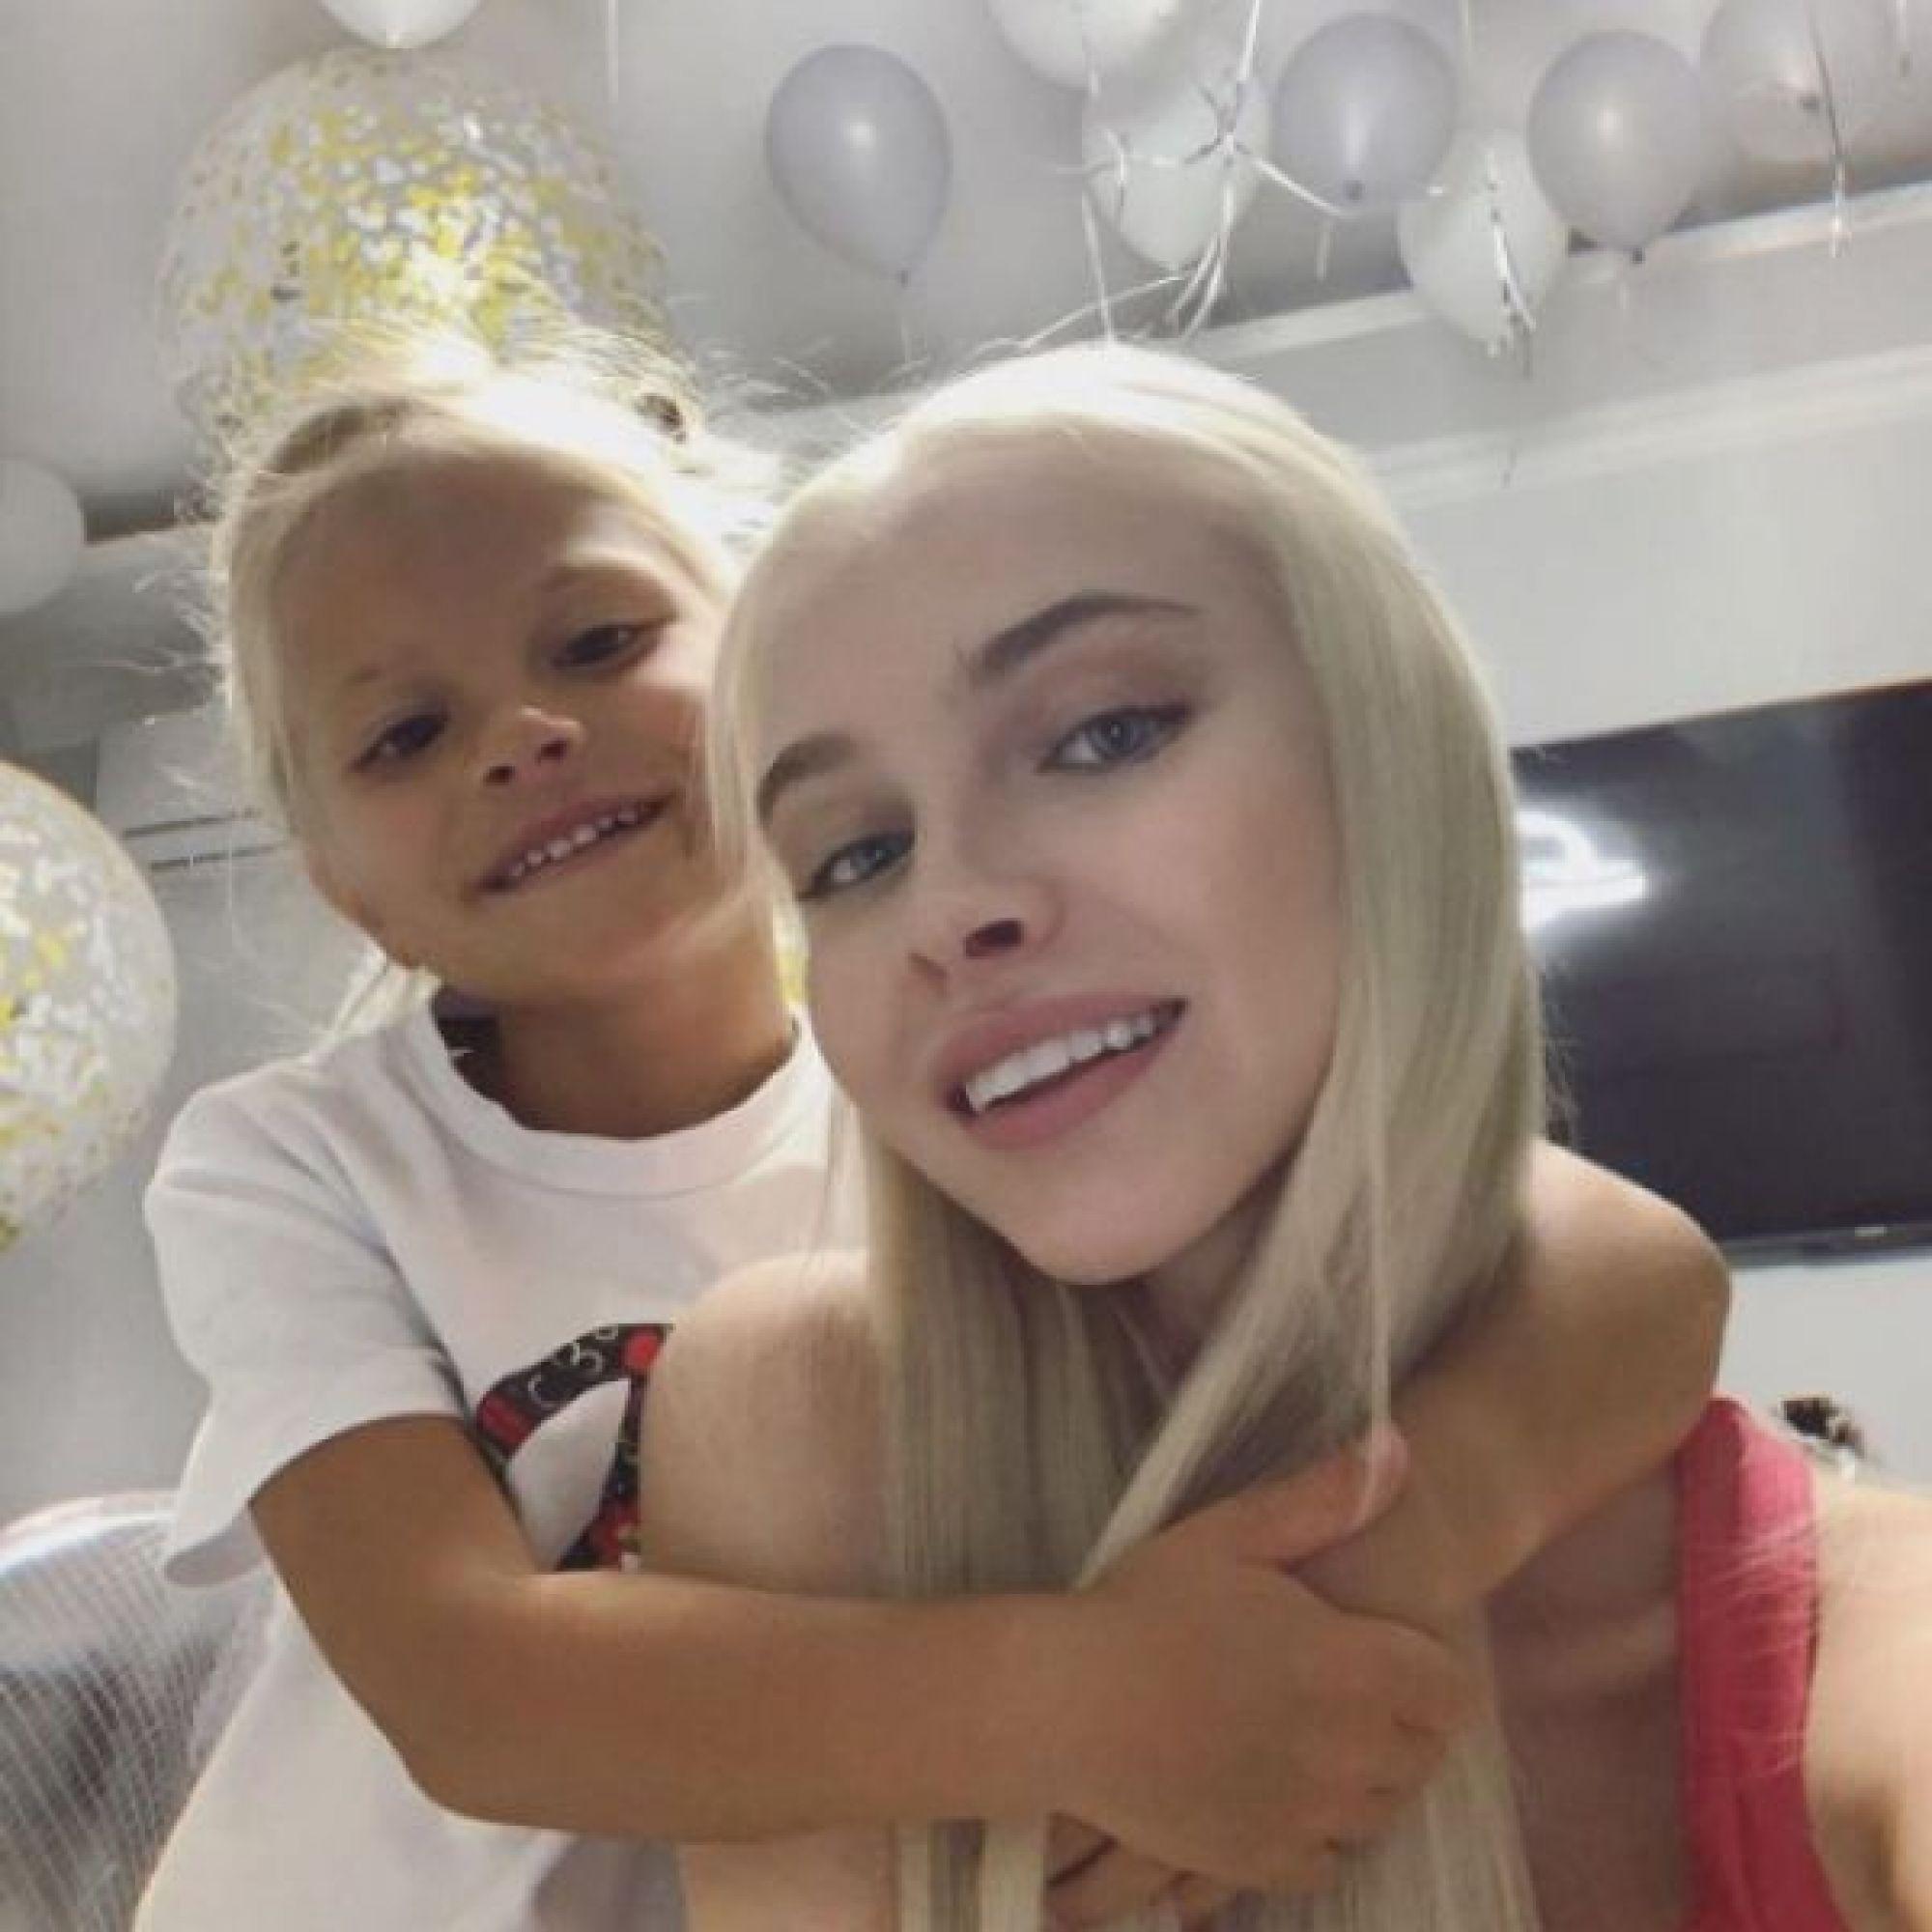 Ждать ли баттла матери против бабушки?: Шишкова отреагировала на скандал о её дочери и матери Тимати